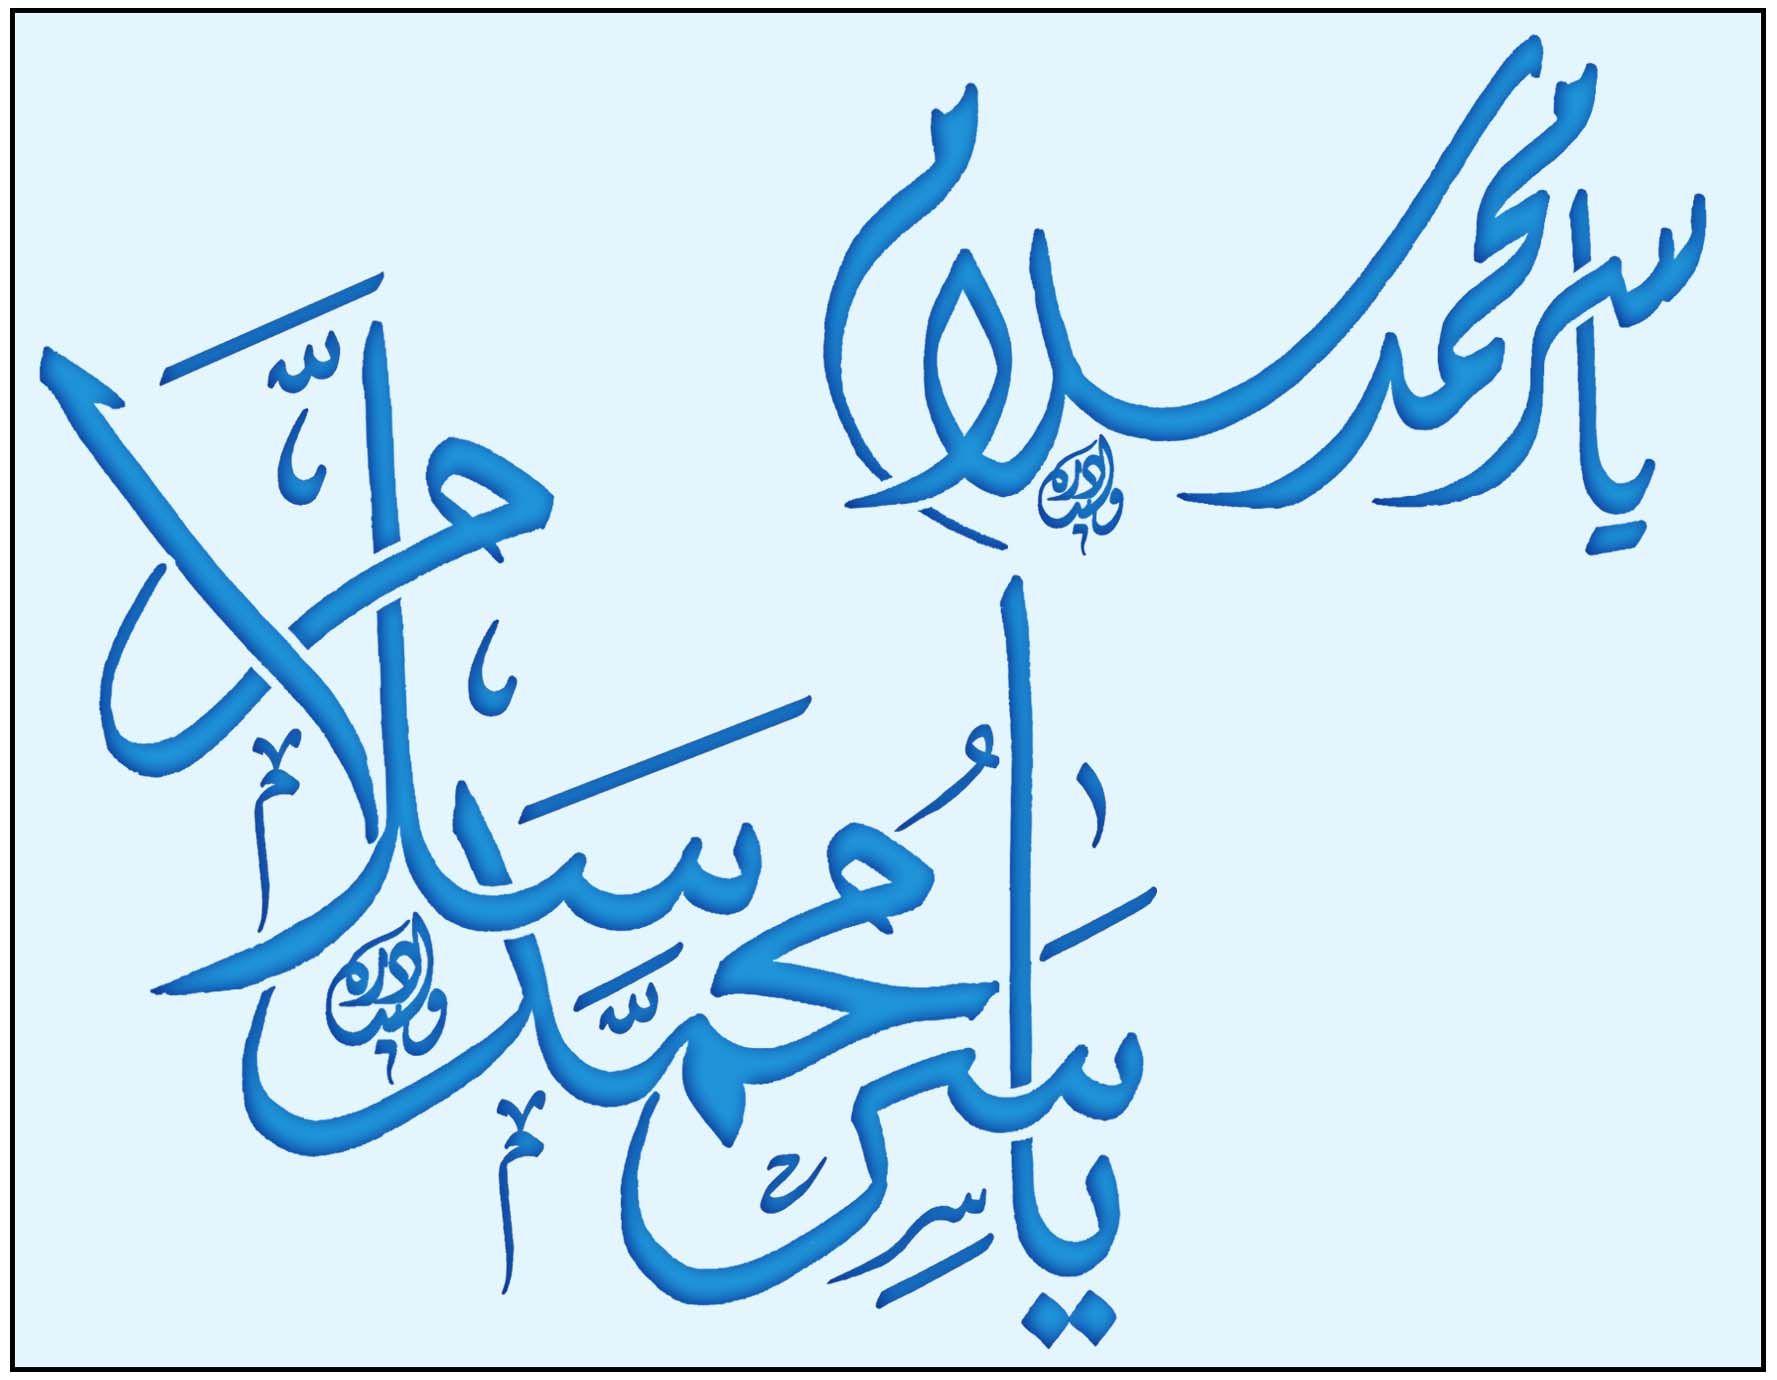 خط عربي ثلث ديواني وليد دره ياسر سلام تركيبة خطية Islamic Art Calligraphy Handwriting Arabic Calligraphy Calligraphy